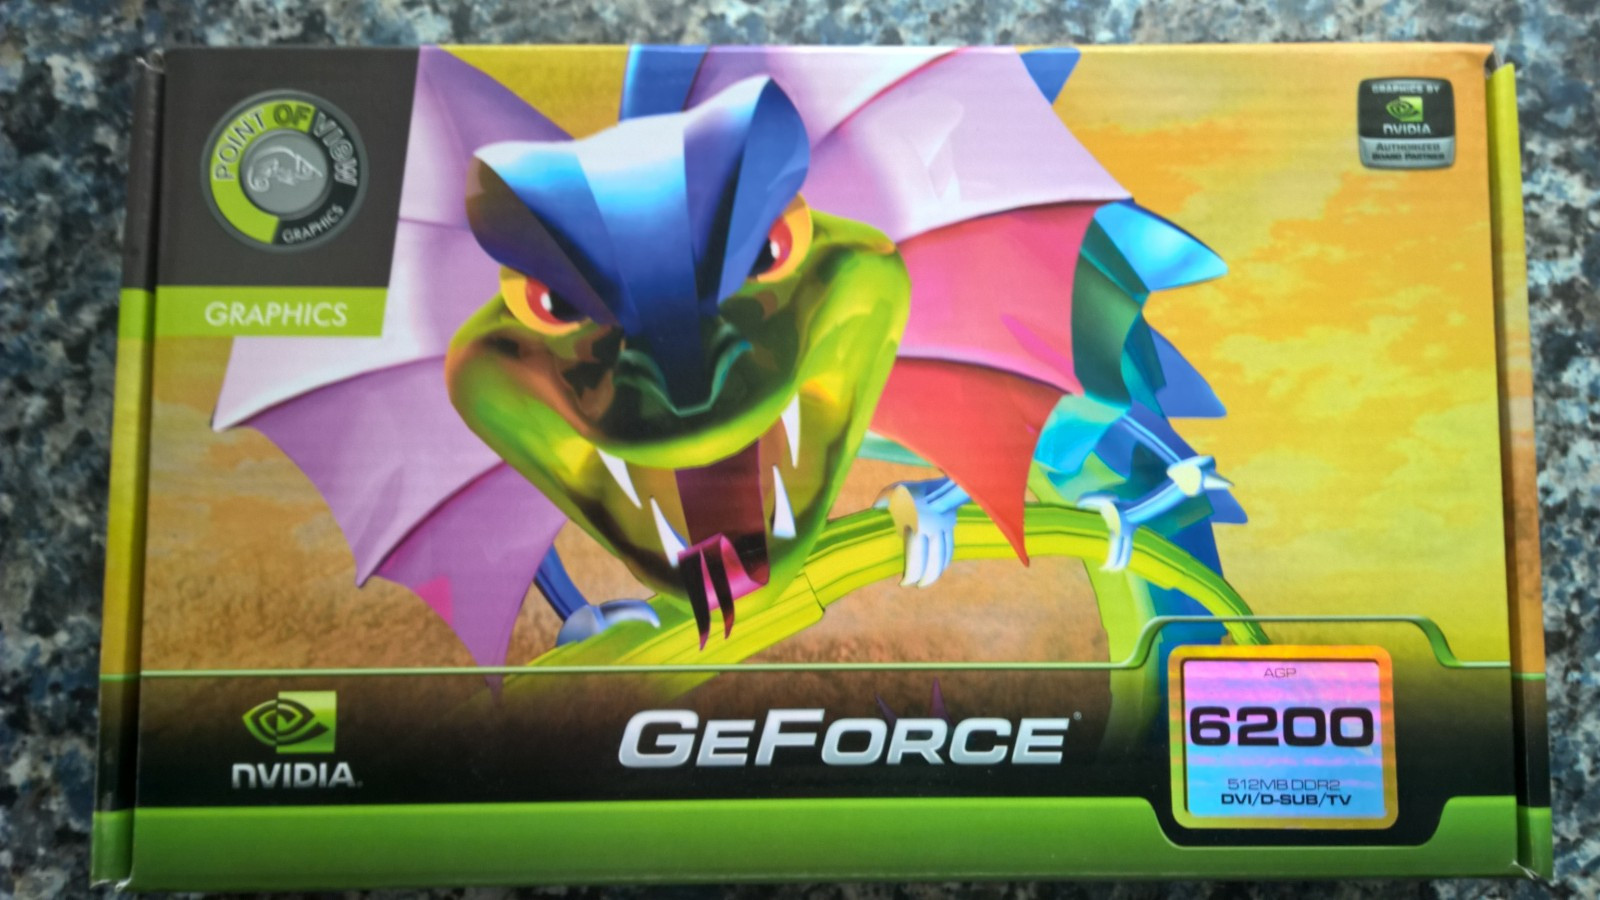 GeForce 6200A skjermkort. Ubrukt - Greåker  - GeForce 6200A skjermkort selges.  Ubrukt. - Greåker